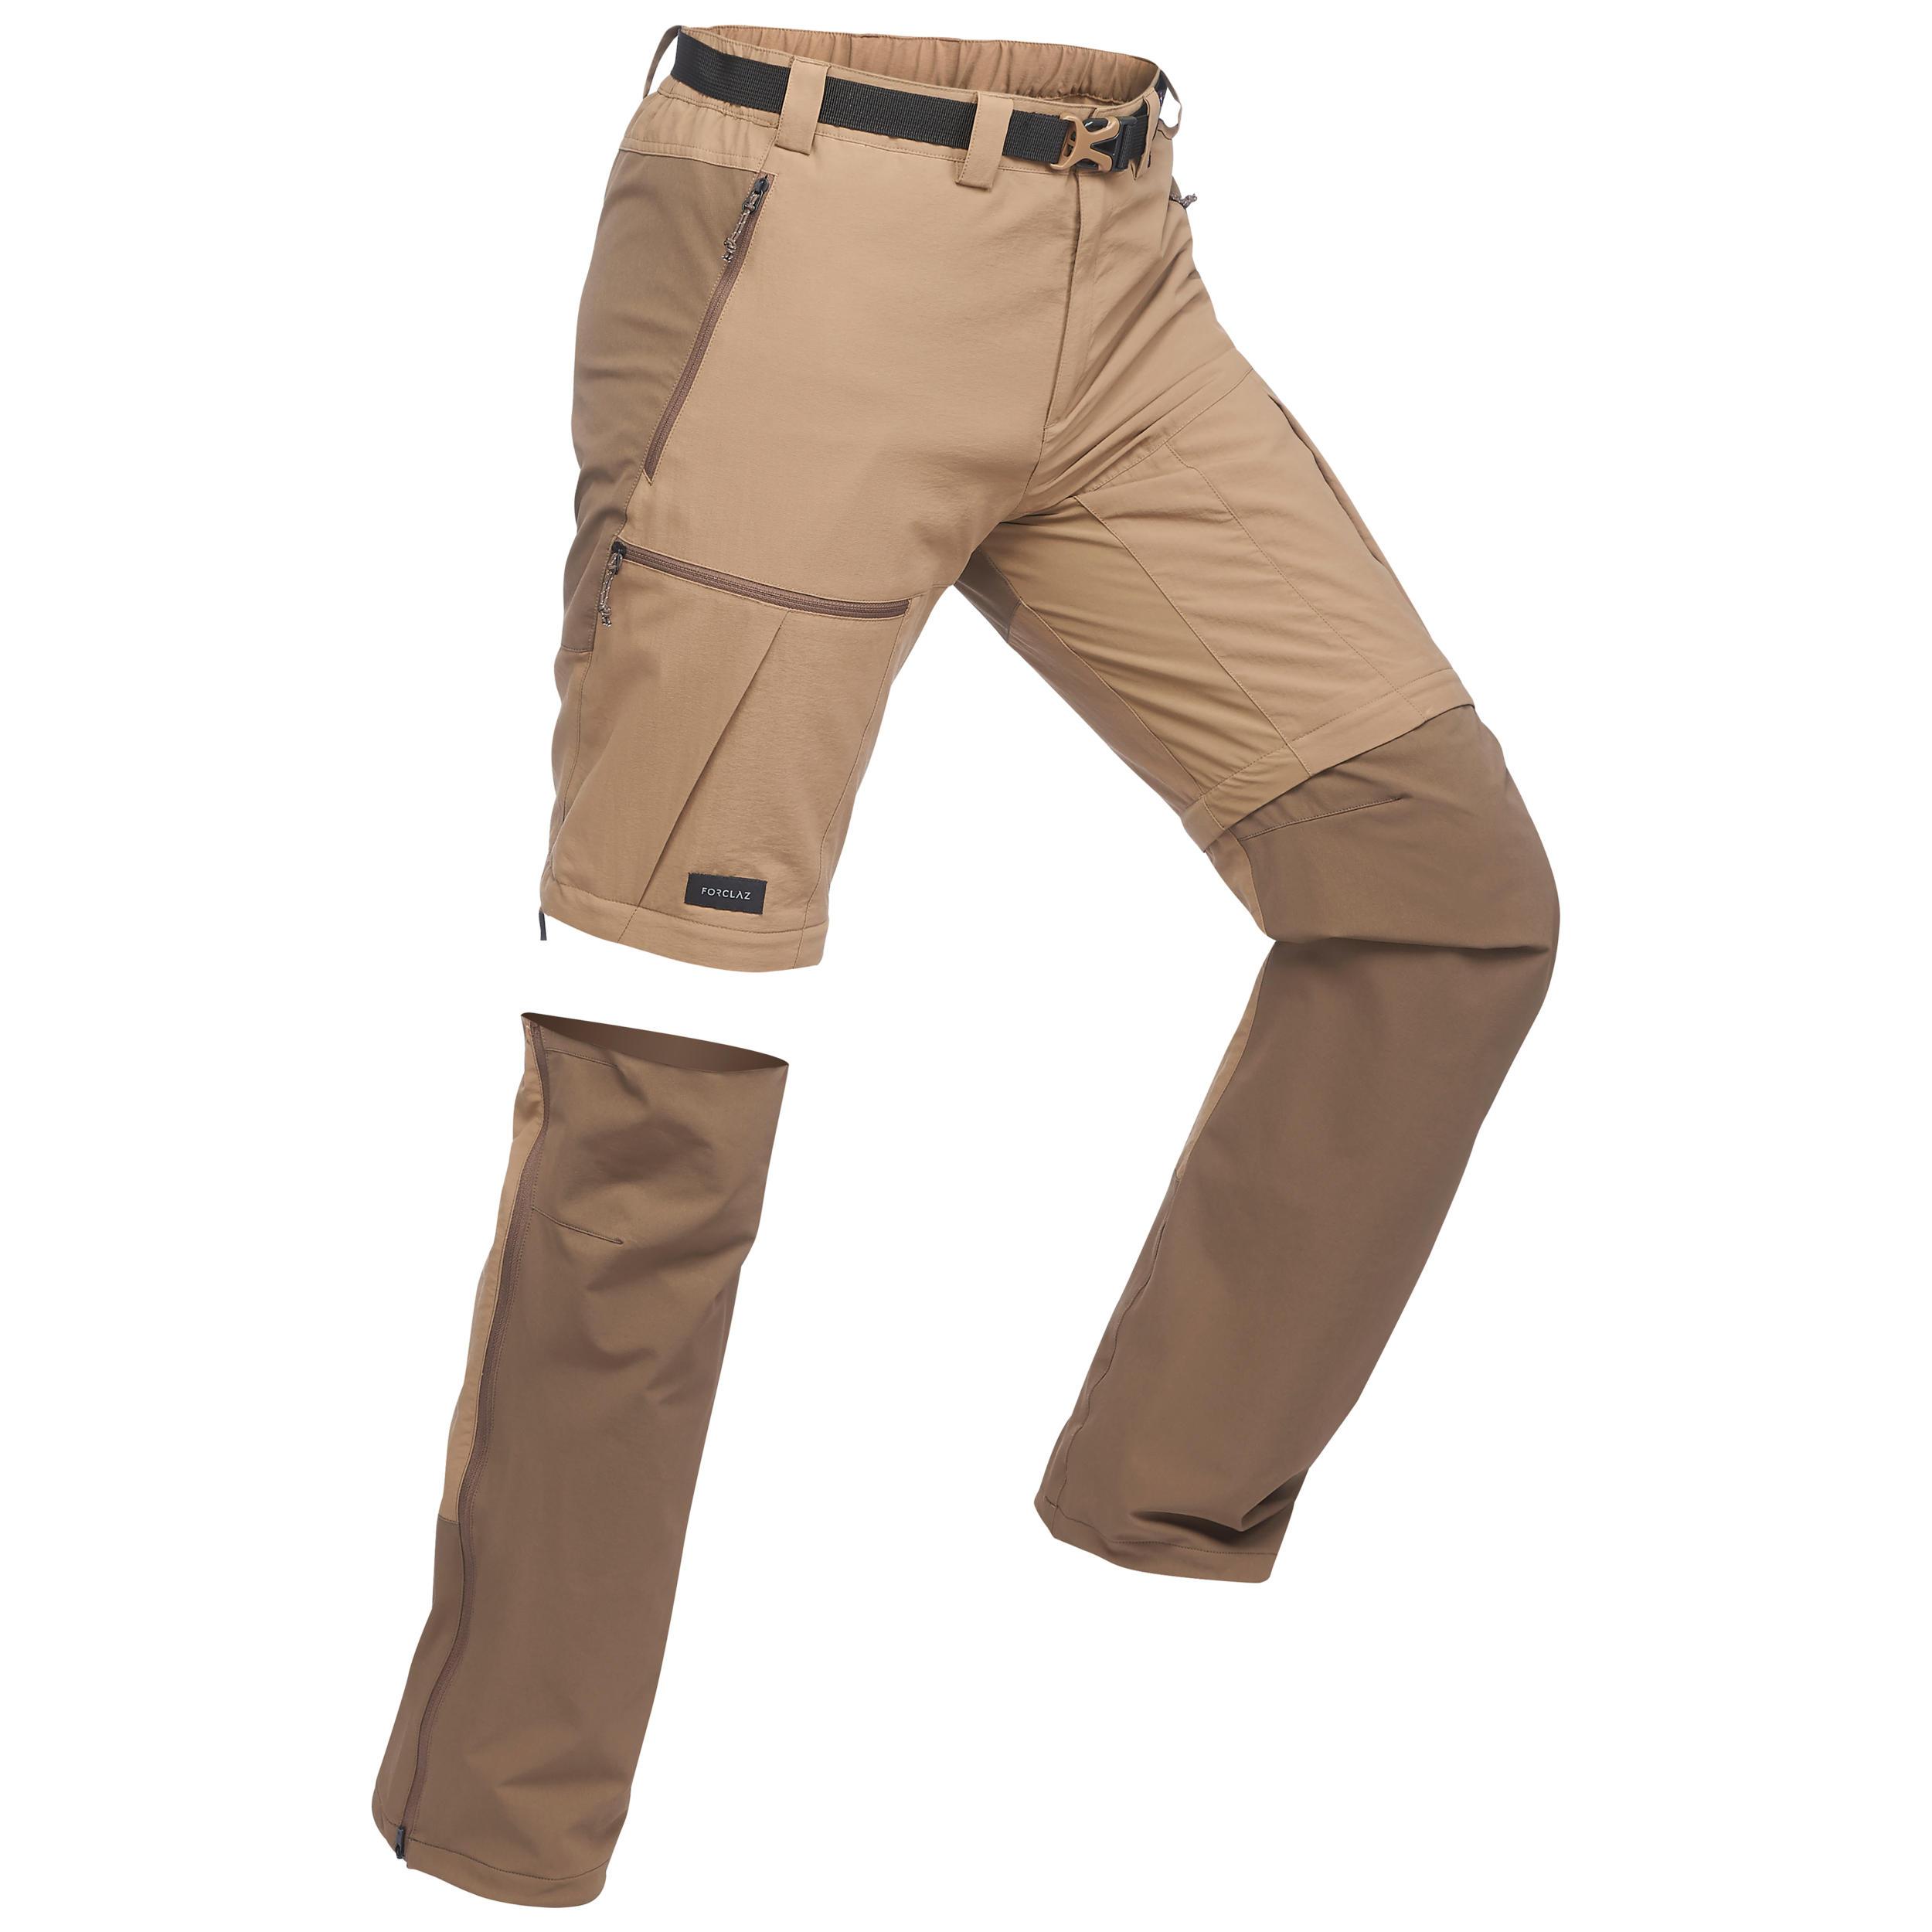 Pantalon TREK 500 bărbați imagine